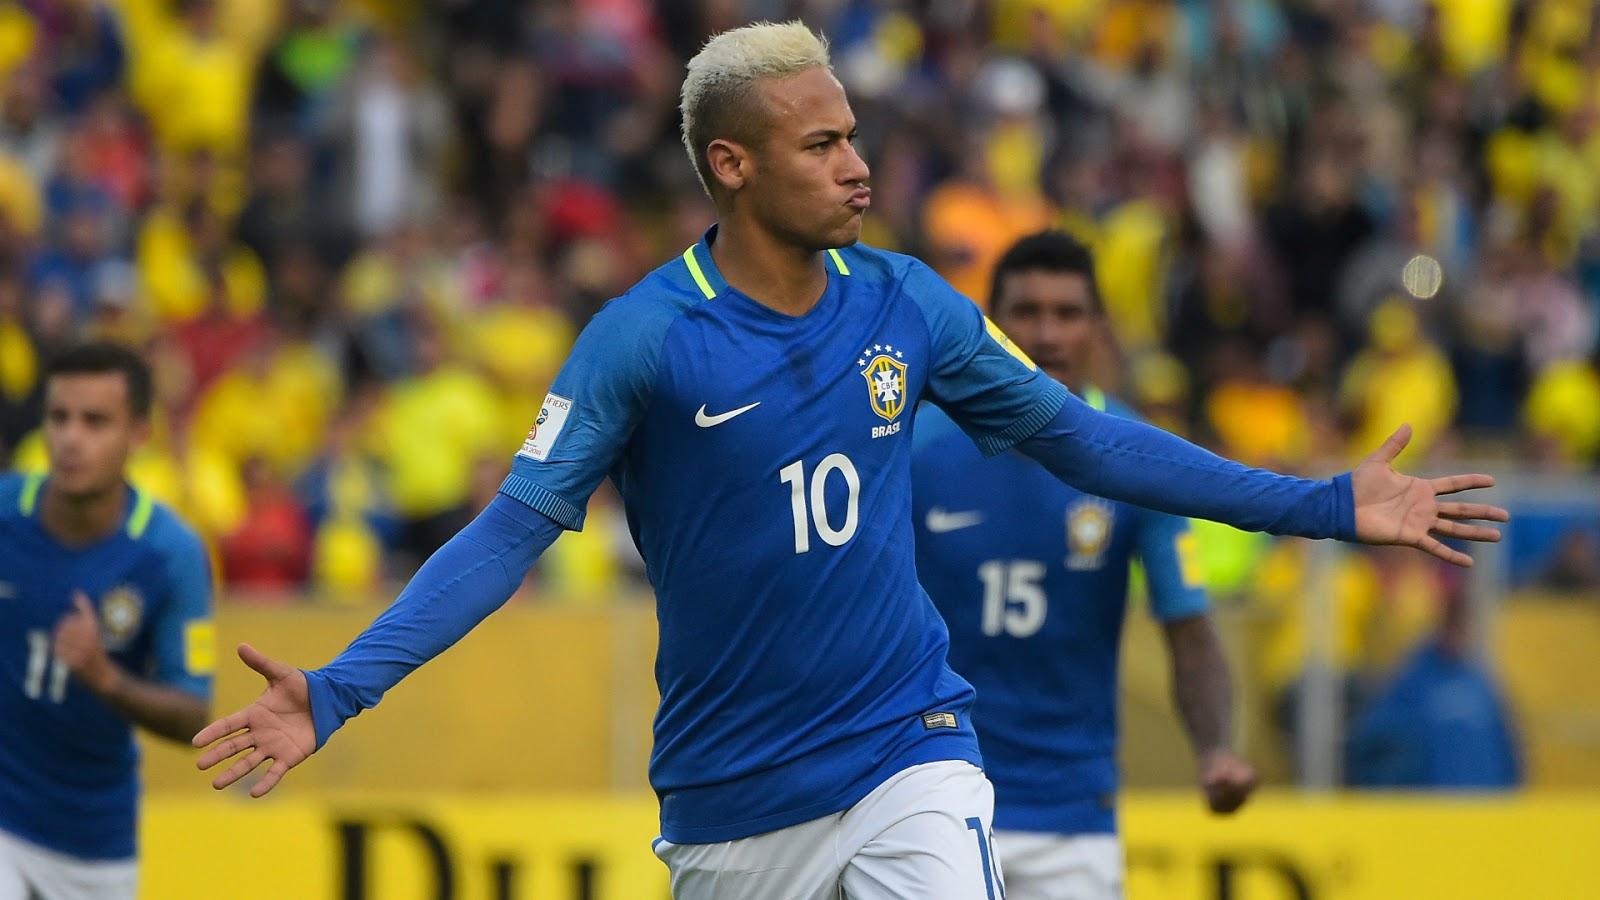 Good Brazil World Cup 2018 - neymar-cropped_10z2x9bk7h0zt19lxecqrf0647  2018_959347 .jpg